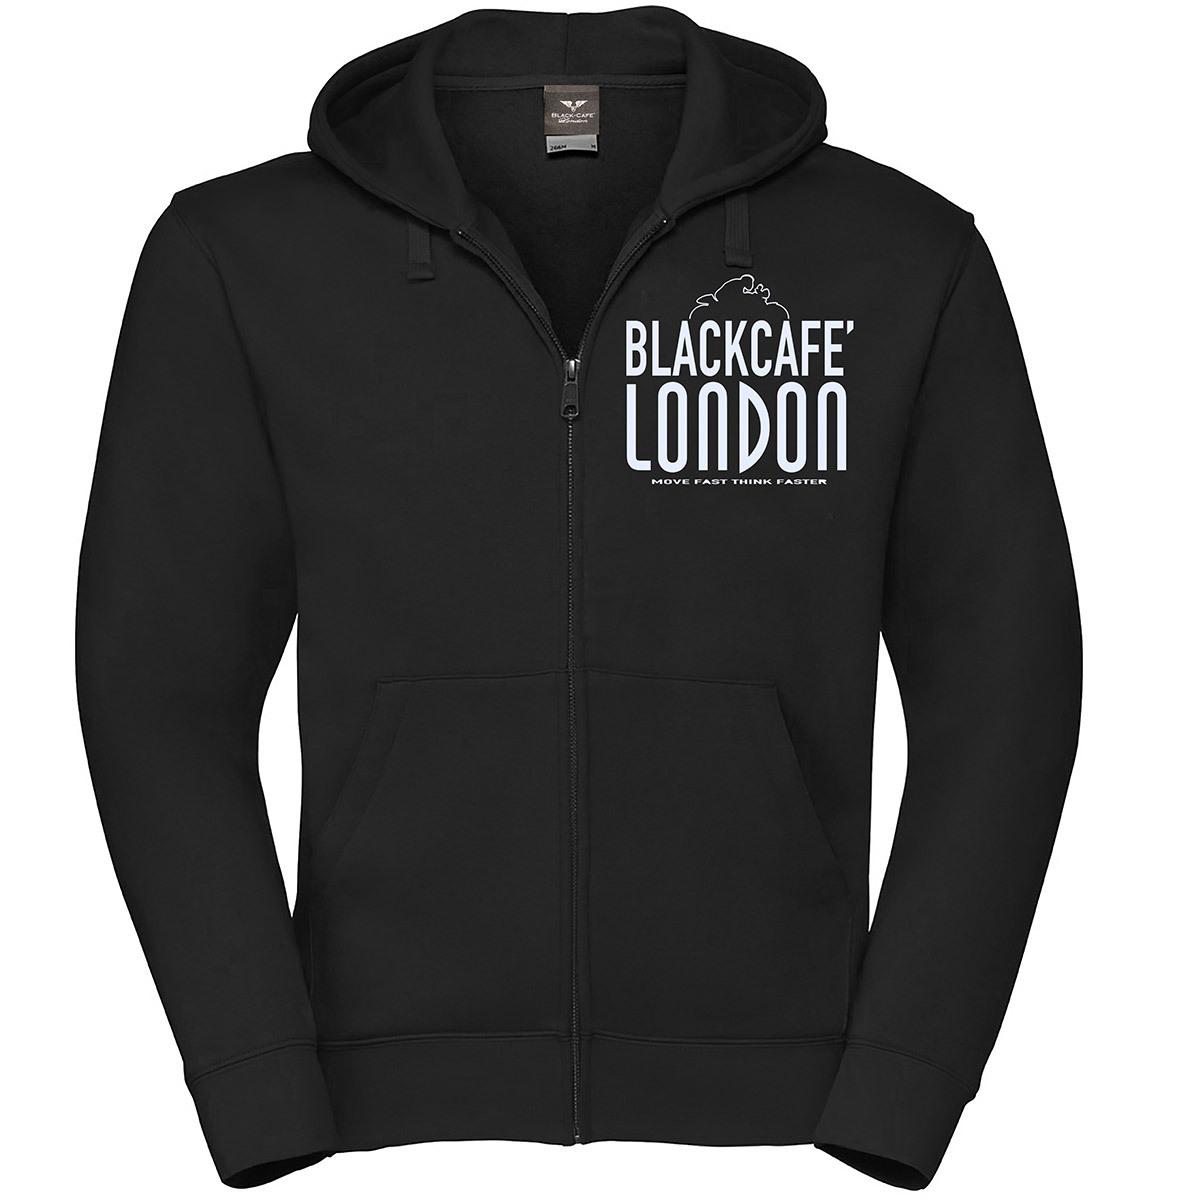 Black-Cafe London Classic Zip Hoodie, schwarz-weiss, Größe 3XL, schwarz-weiss, Größe 3XL